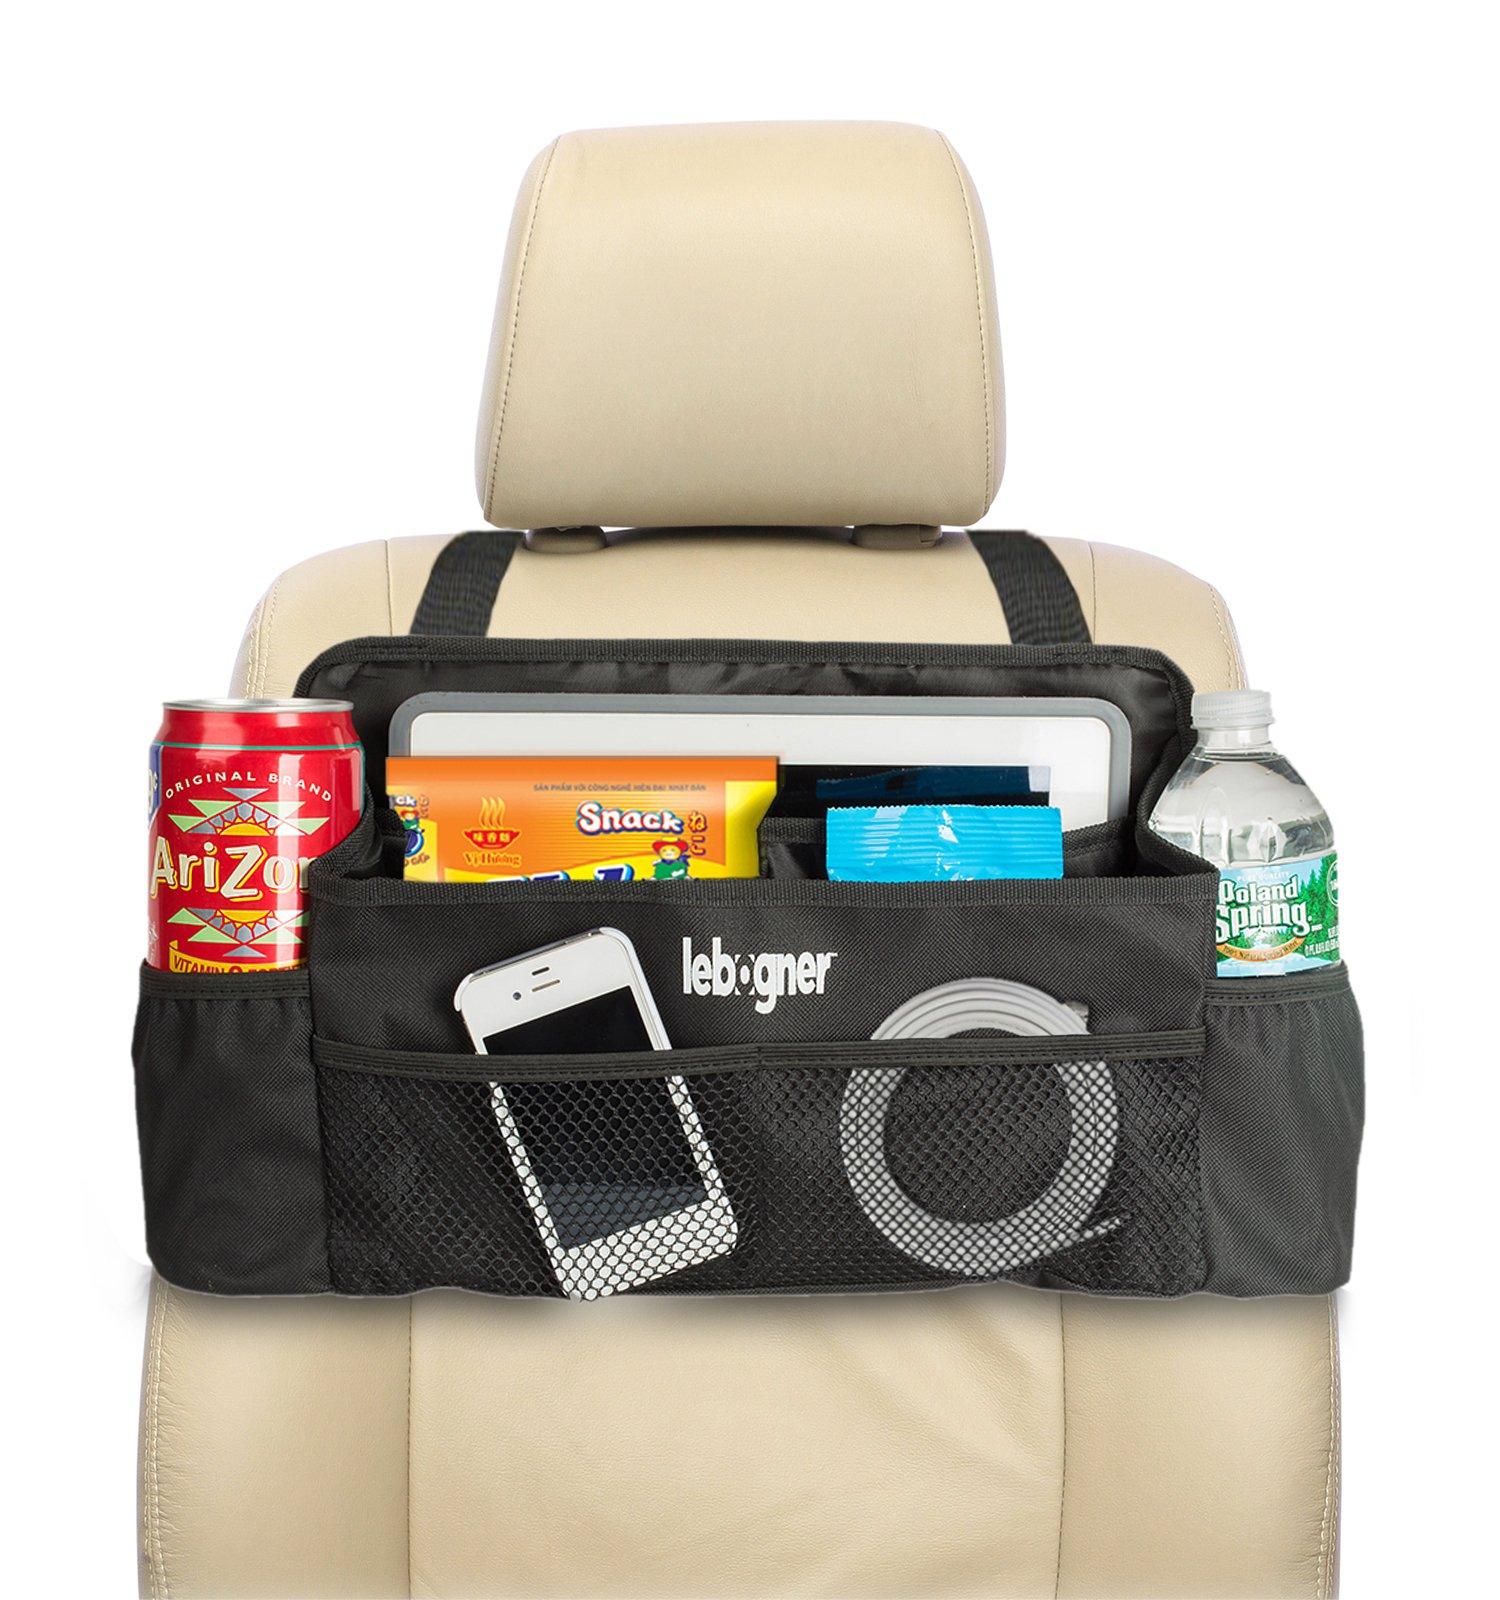 lebogner #1 Luxury CAR Organizer, Perfect Front Seat Organizer, Driver Organizer, Backseat Organizer, Car Seat Organizer for Kids, Black. by lebogner